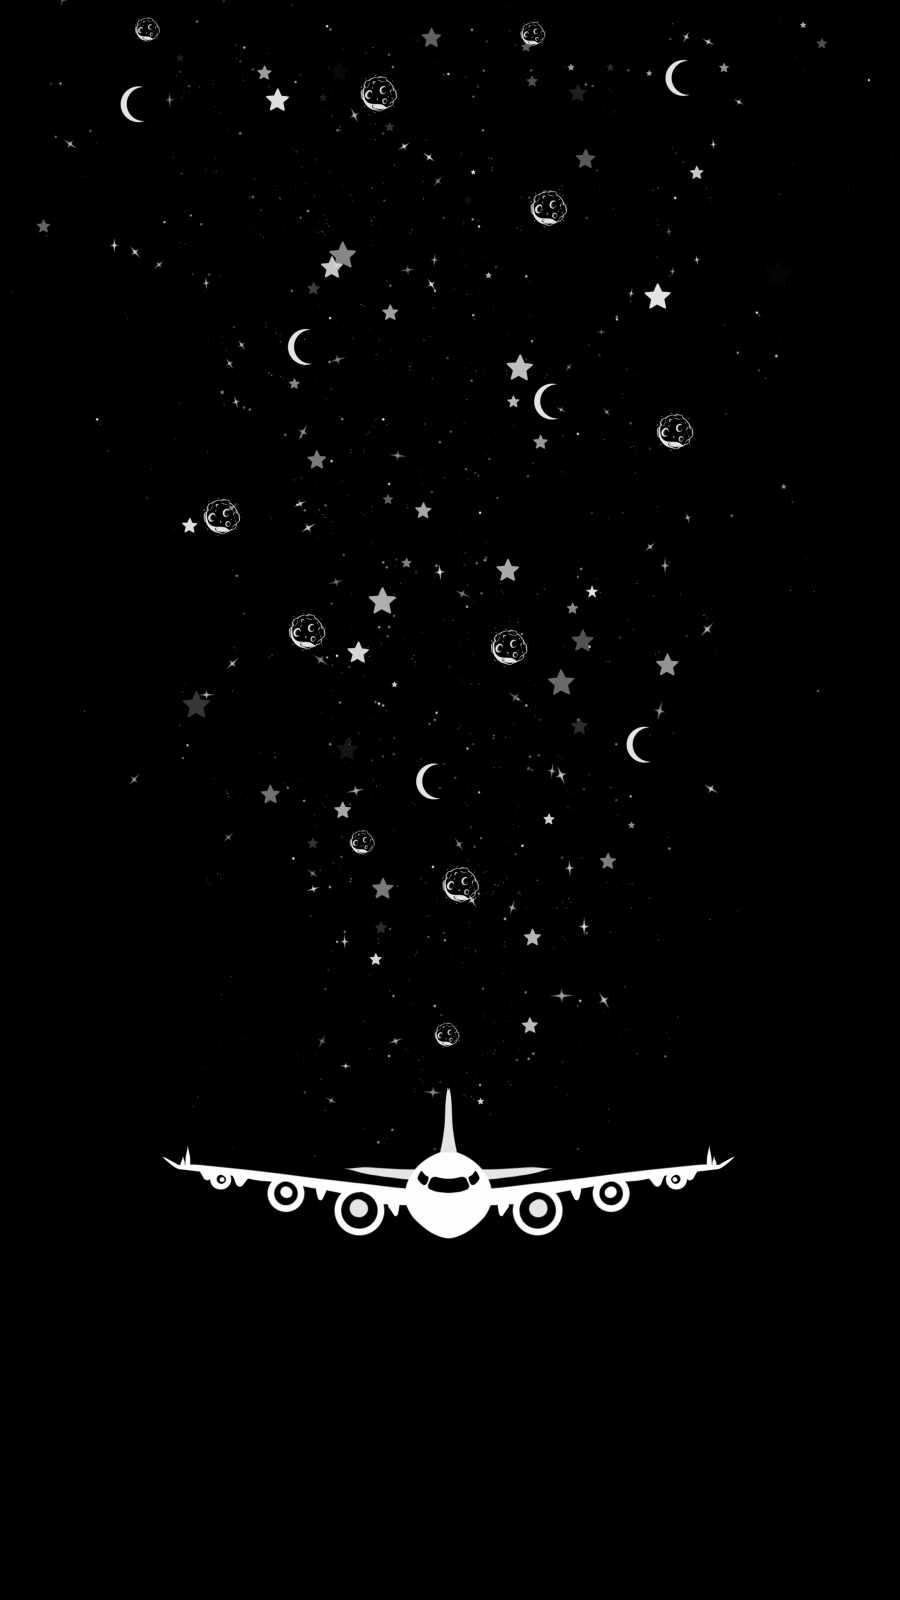 Star Plane iPhone Wallpaper